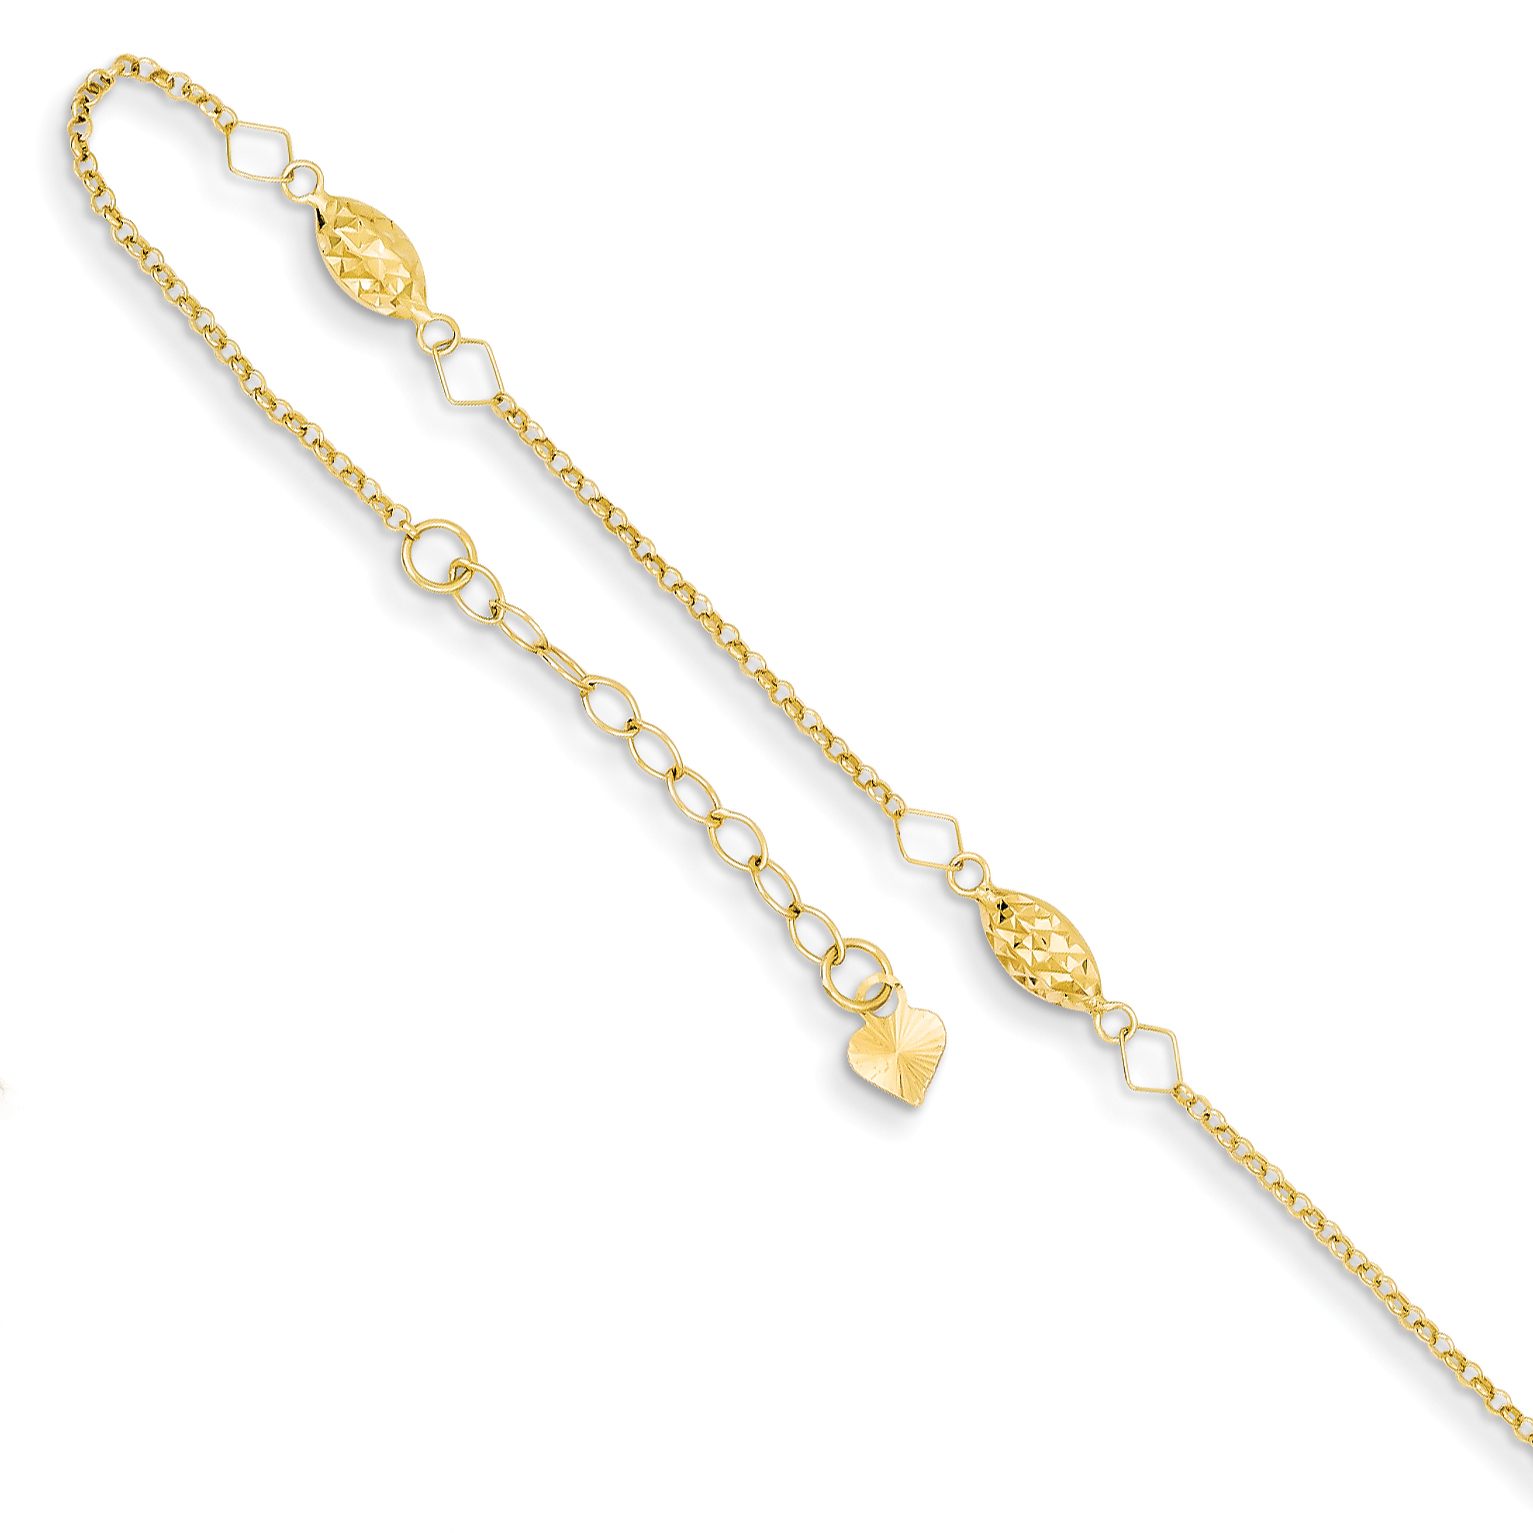 14K Whtie Gold 9in Adjustable Star Anklet w// 1inch extender